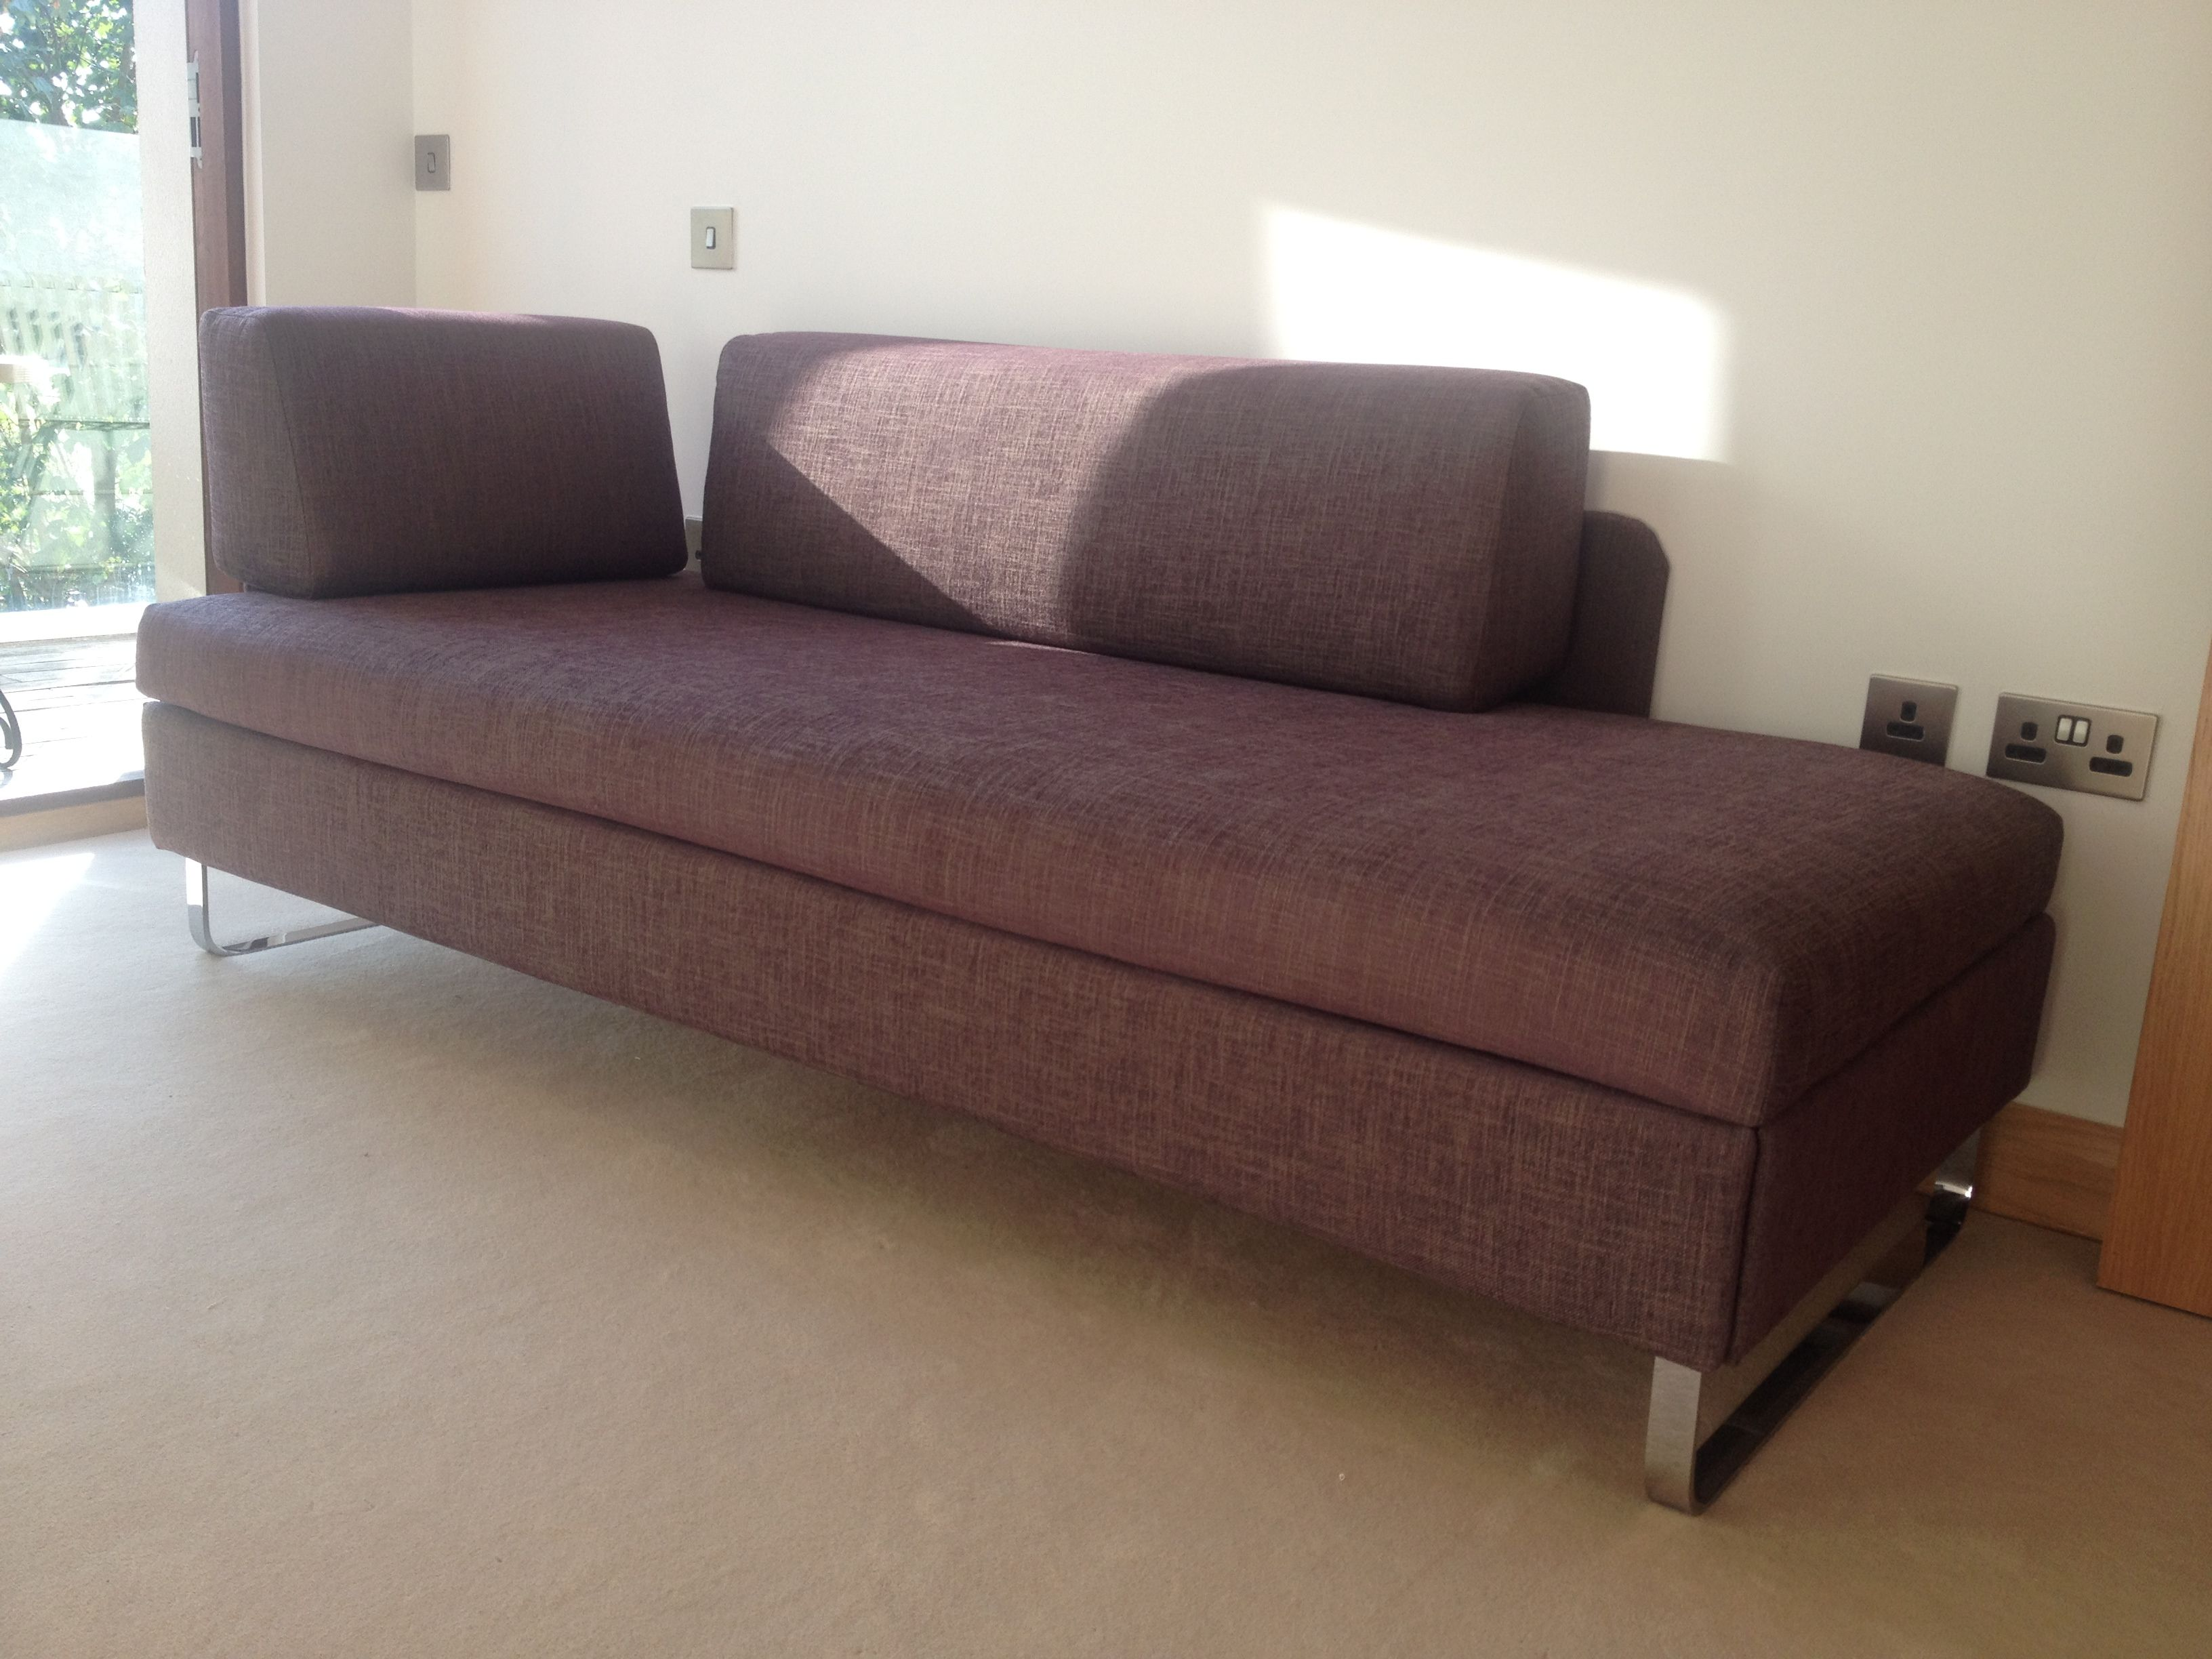 Brown Fabric Chrome Ski Legs Doppio Sofa Bed 205 Cm X